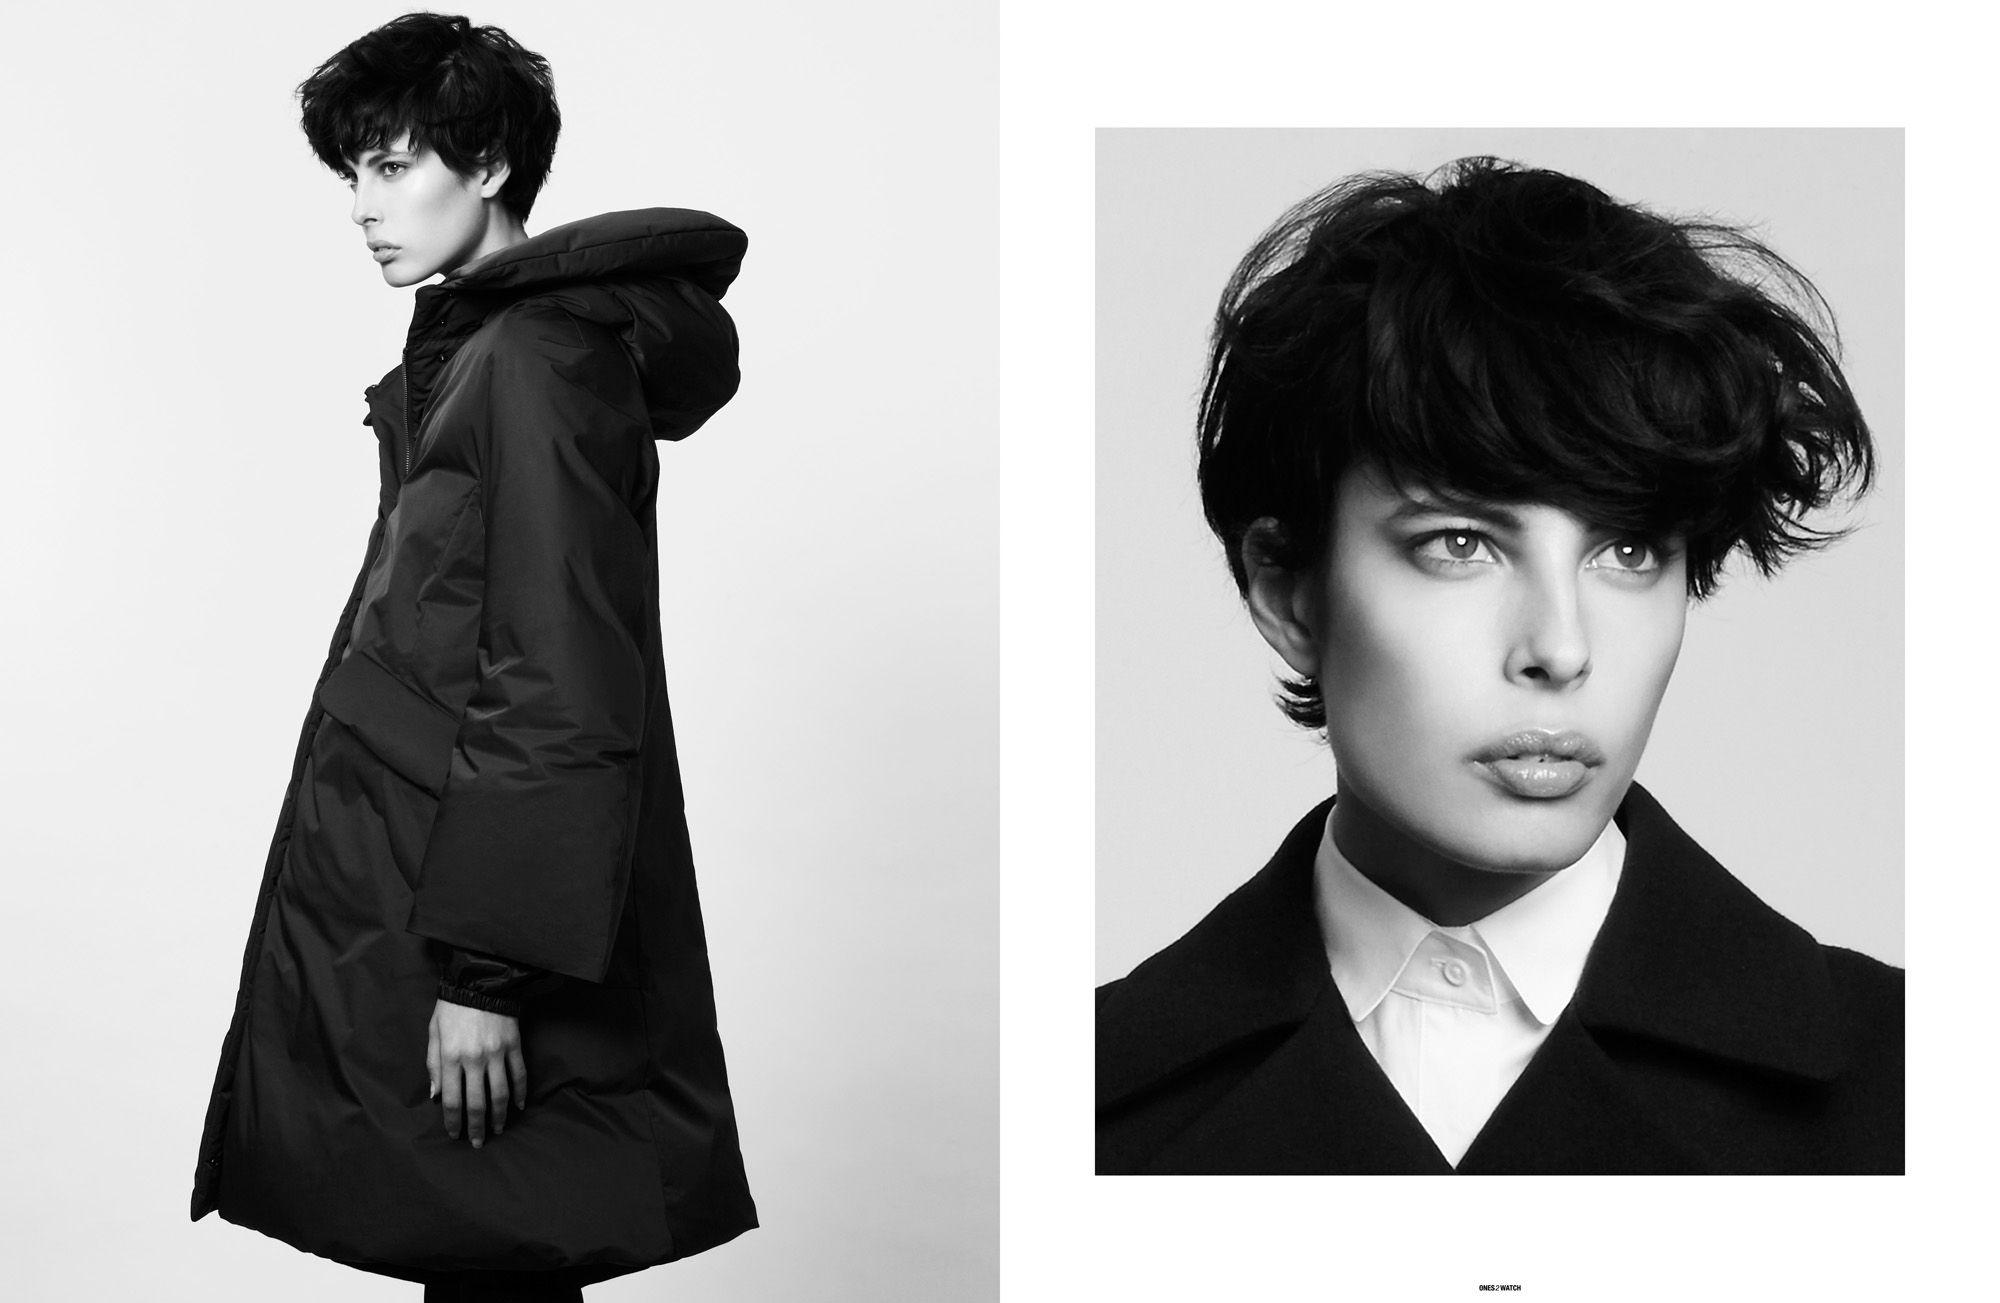 Photography by Maria Karas Styling by Hissa Igarashi Pure